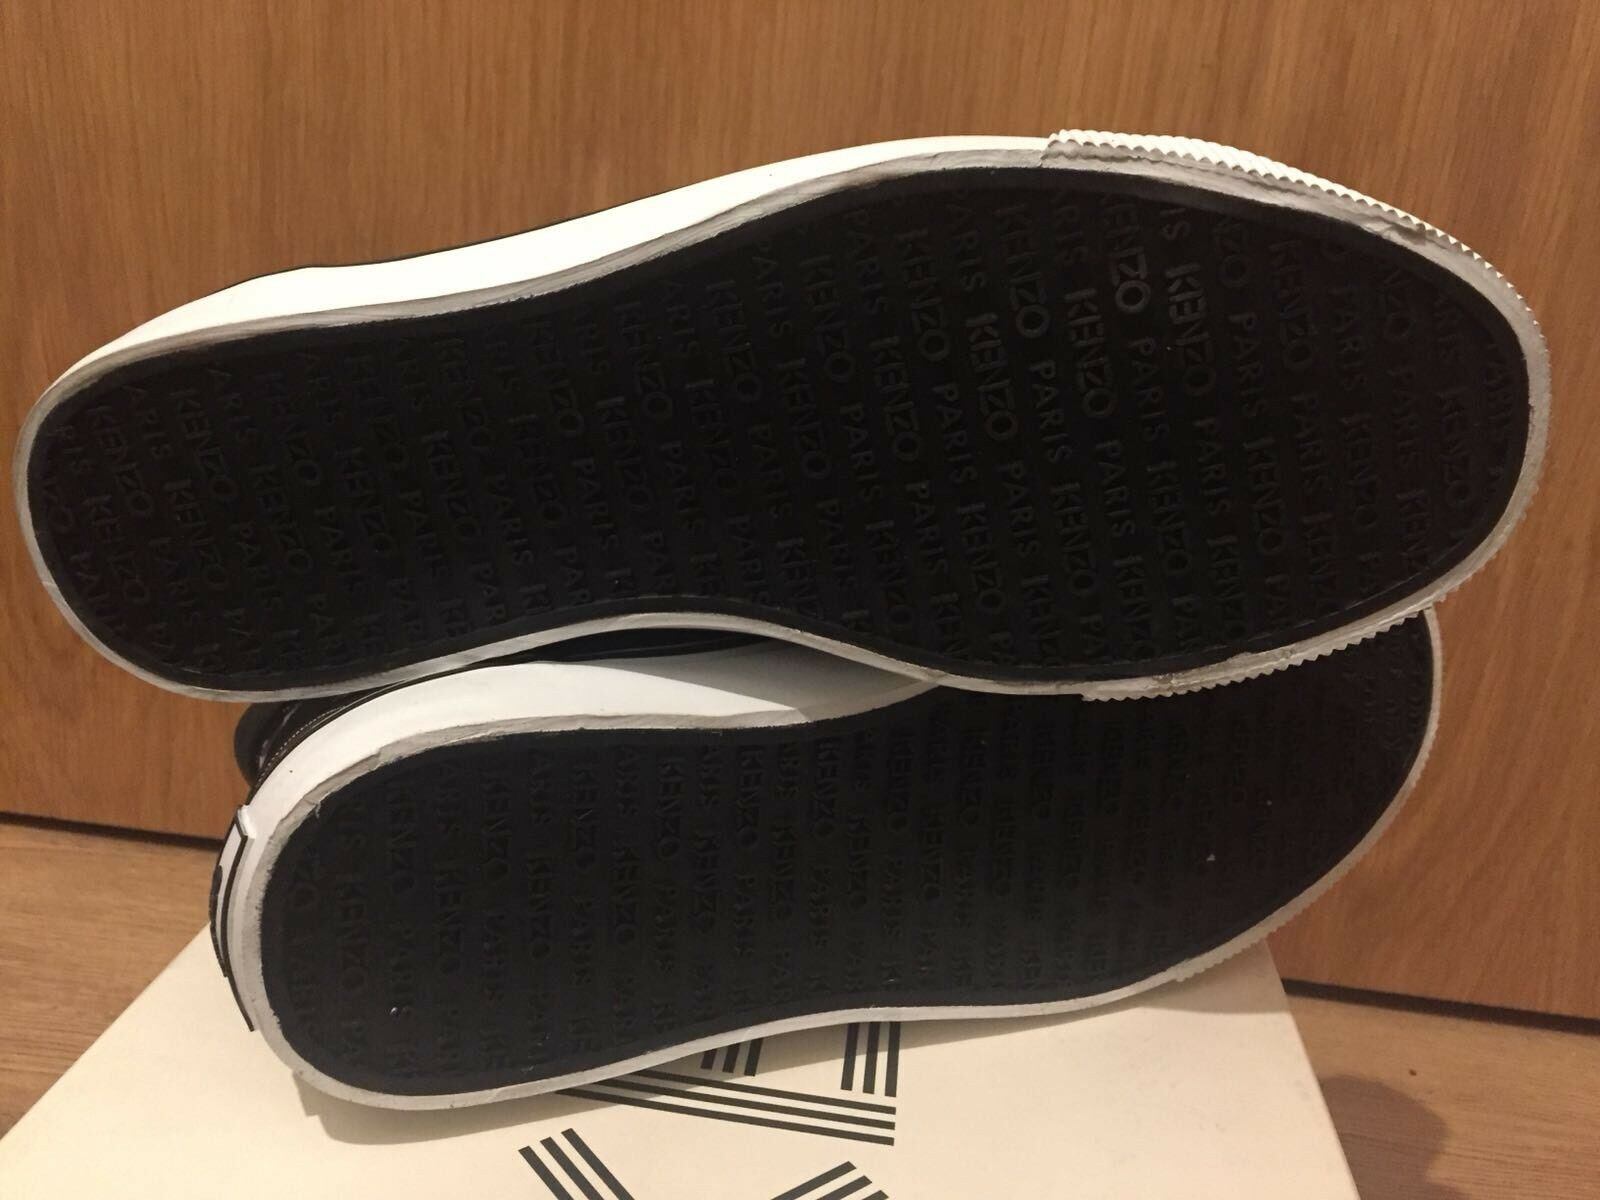 Stampa SU TELA Kenzo Eye scarpe da ginnastica Alte    EU 40 d68996